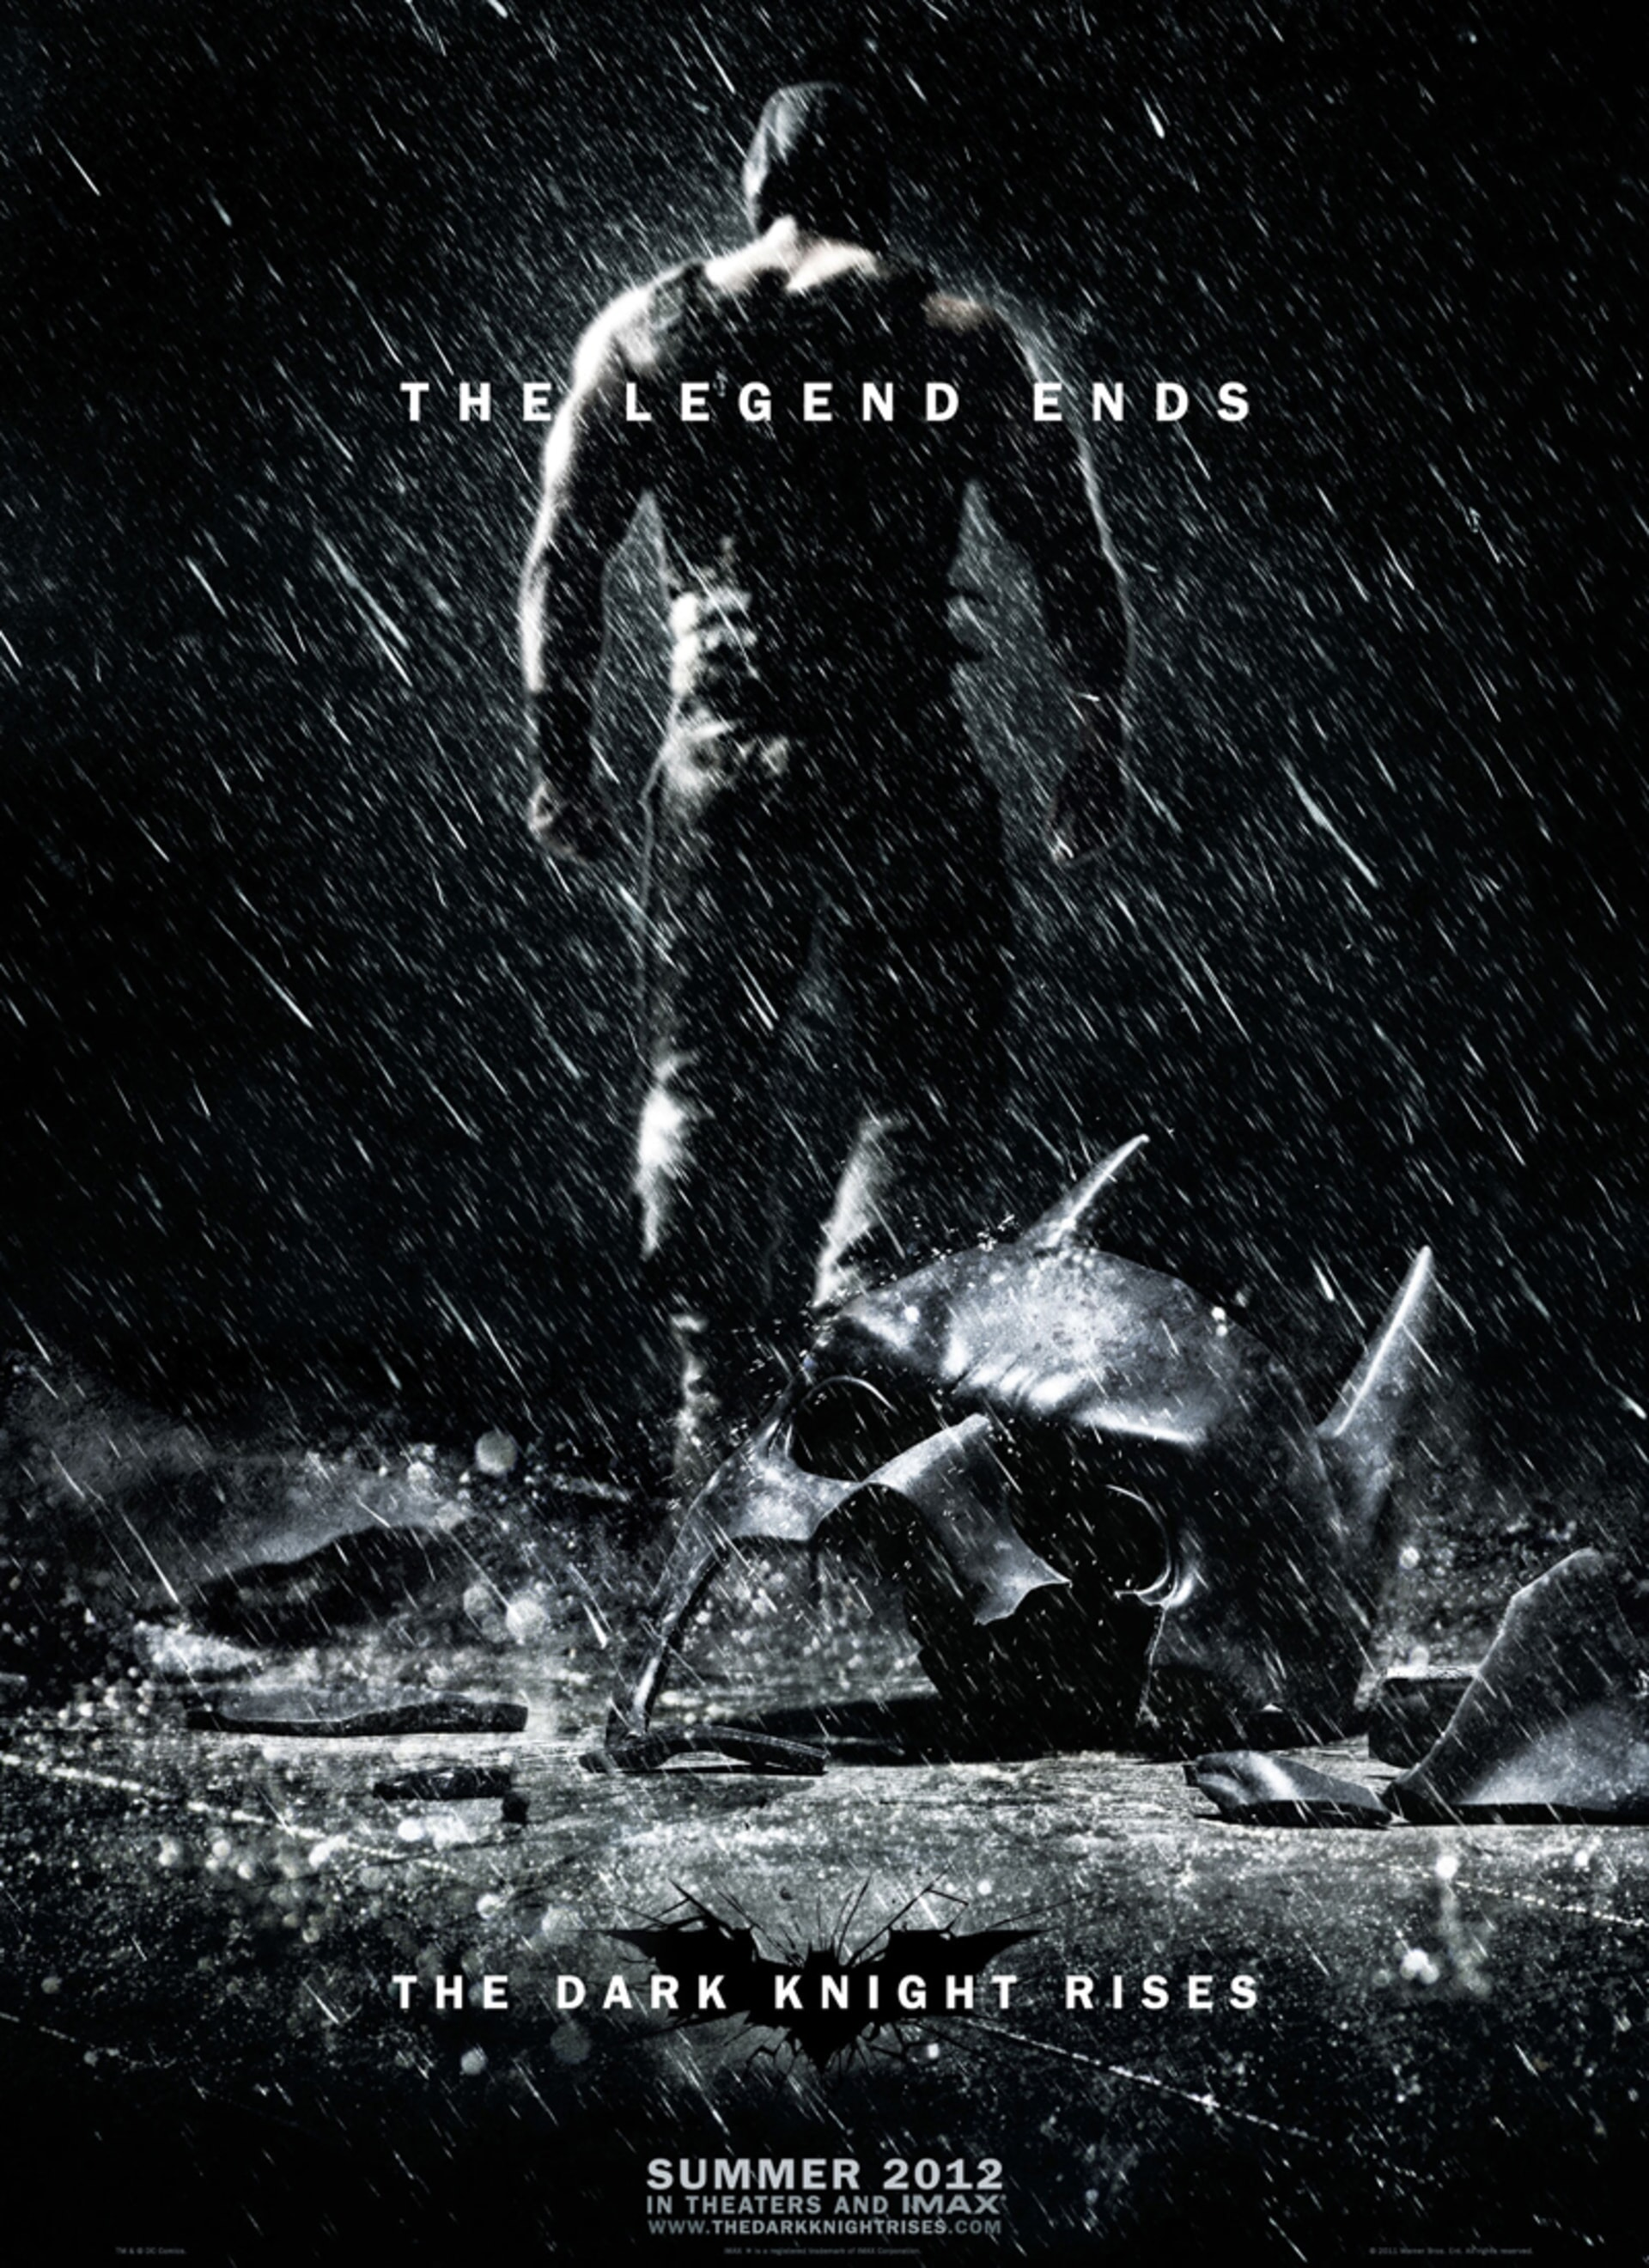 The Dark Knight Rises - Poster 2